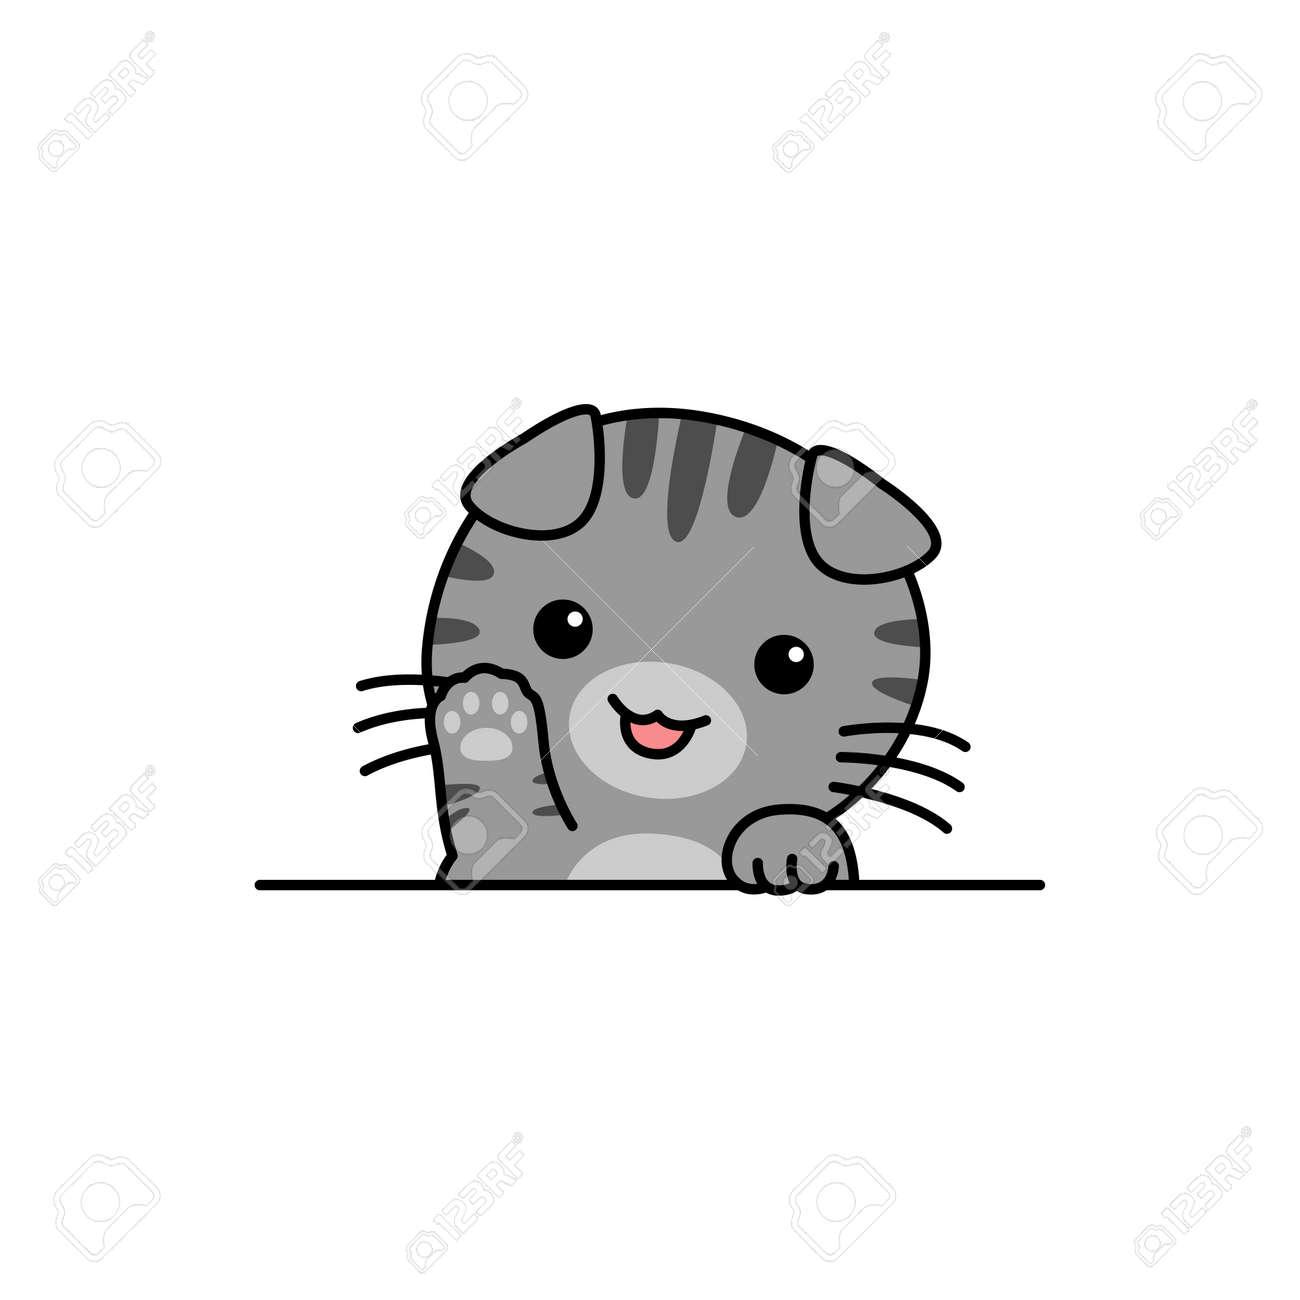 Cute scottish fold cat waving paw cartoon, vector illustration - 169153207